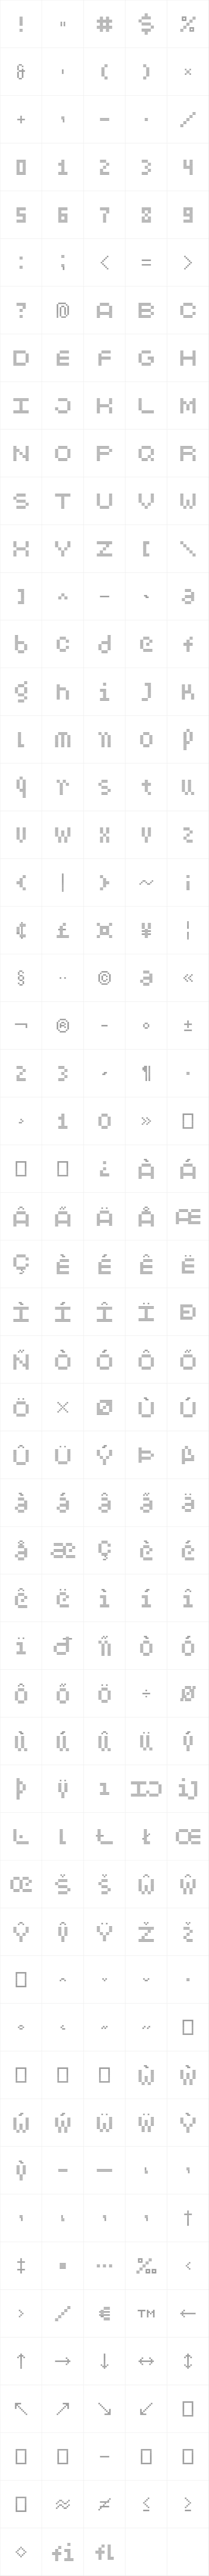 PixelParty 13